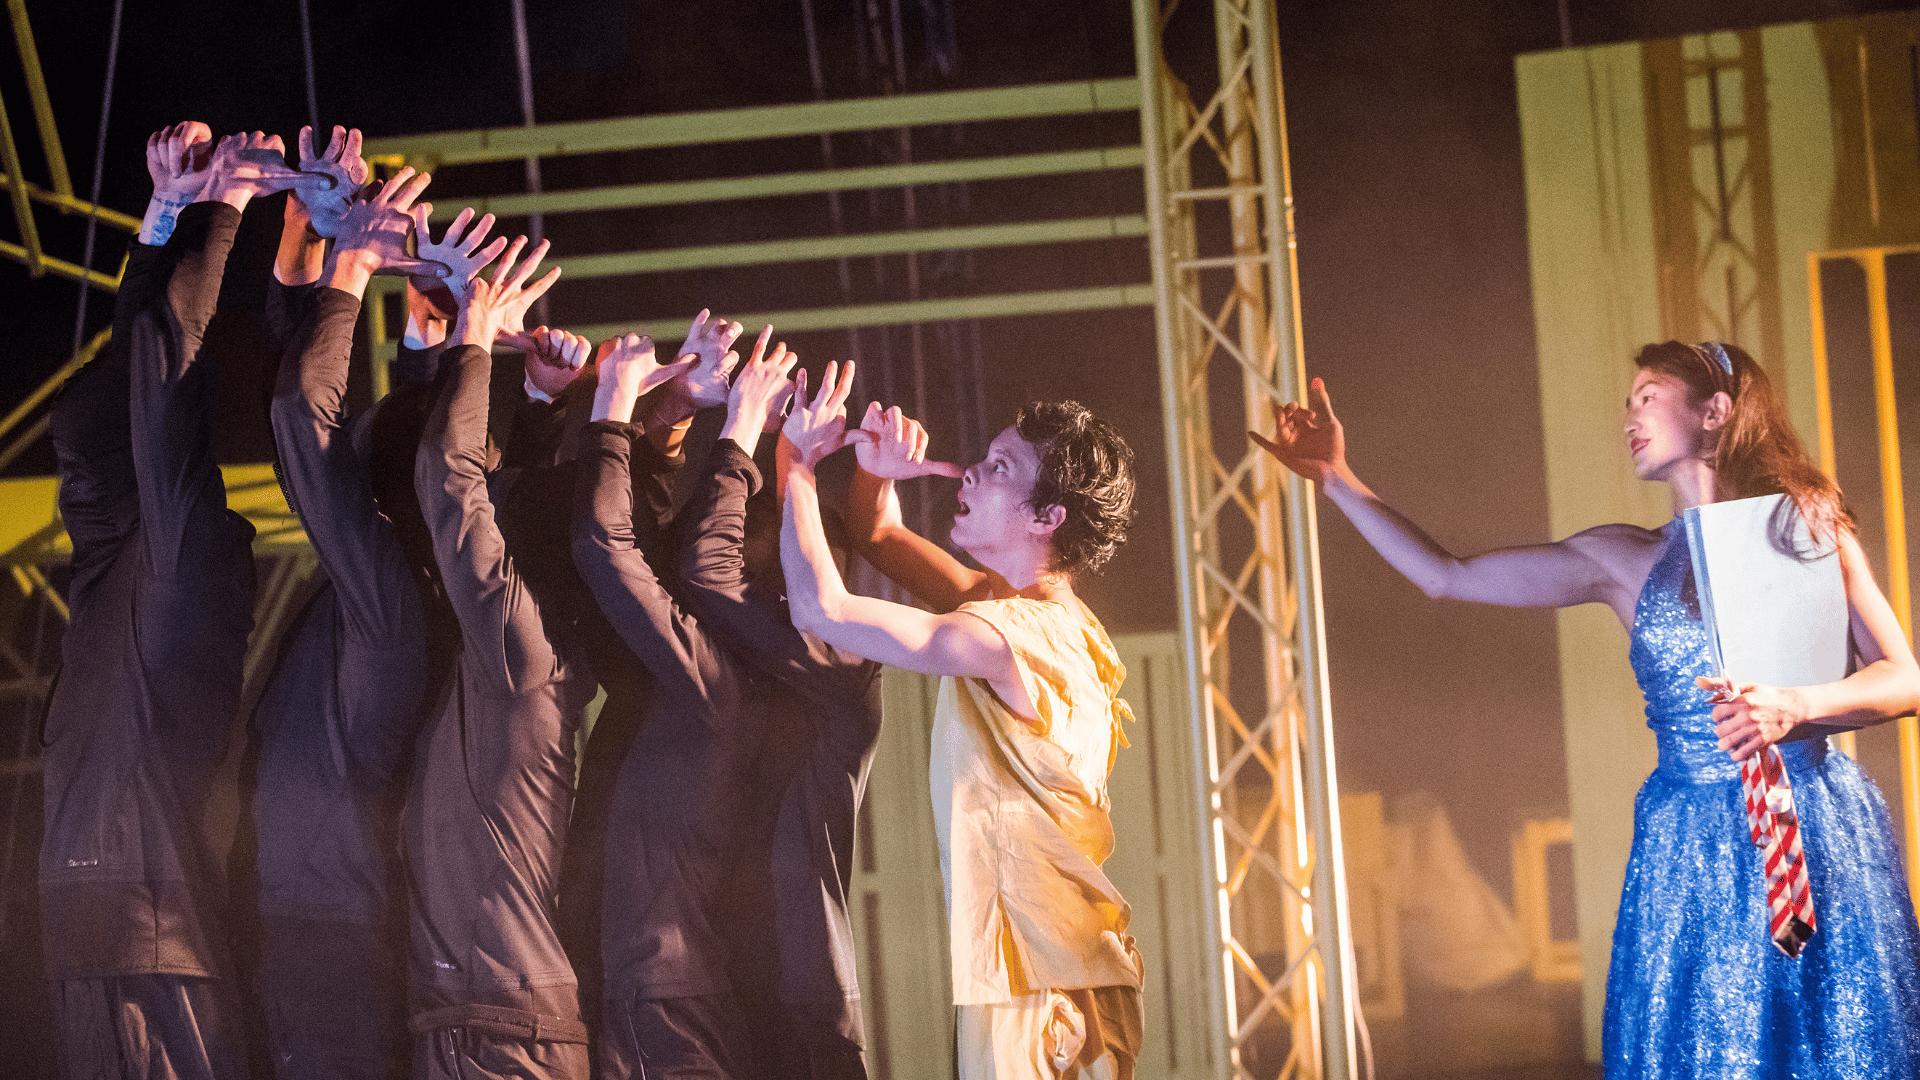 JVC' Pinocchio, featuring dancers Maria Doulgeri, Aoi Nakamura